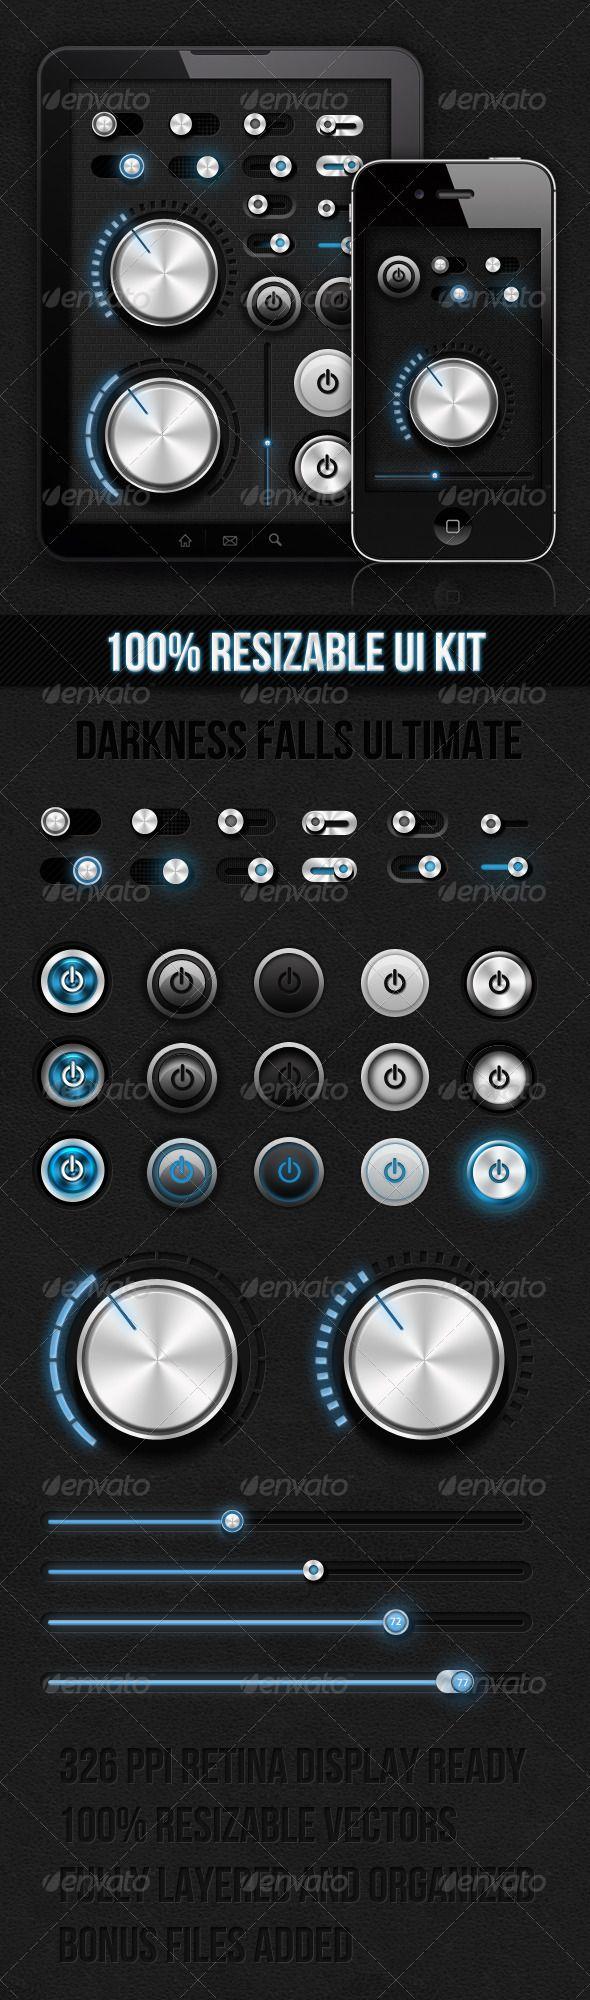 Dark Ui Kit - Darkness Falls Ultimate - #User #Interfaces #Web Elements Download here: https://graphicriver.net/item/dark-ui-kit-darkness-falls-ultimate/2446720?ref=alena994